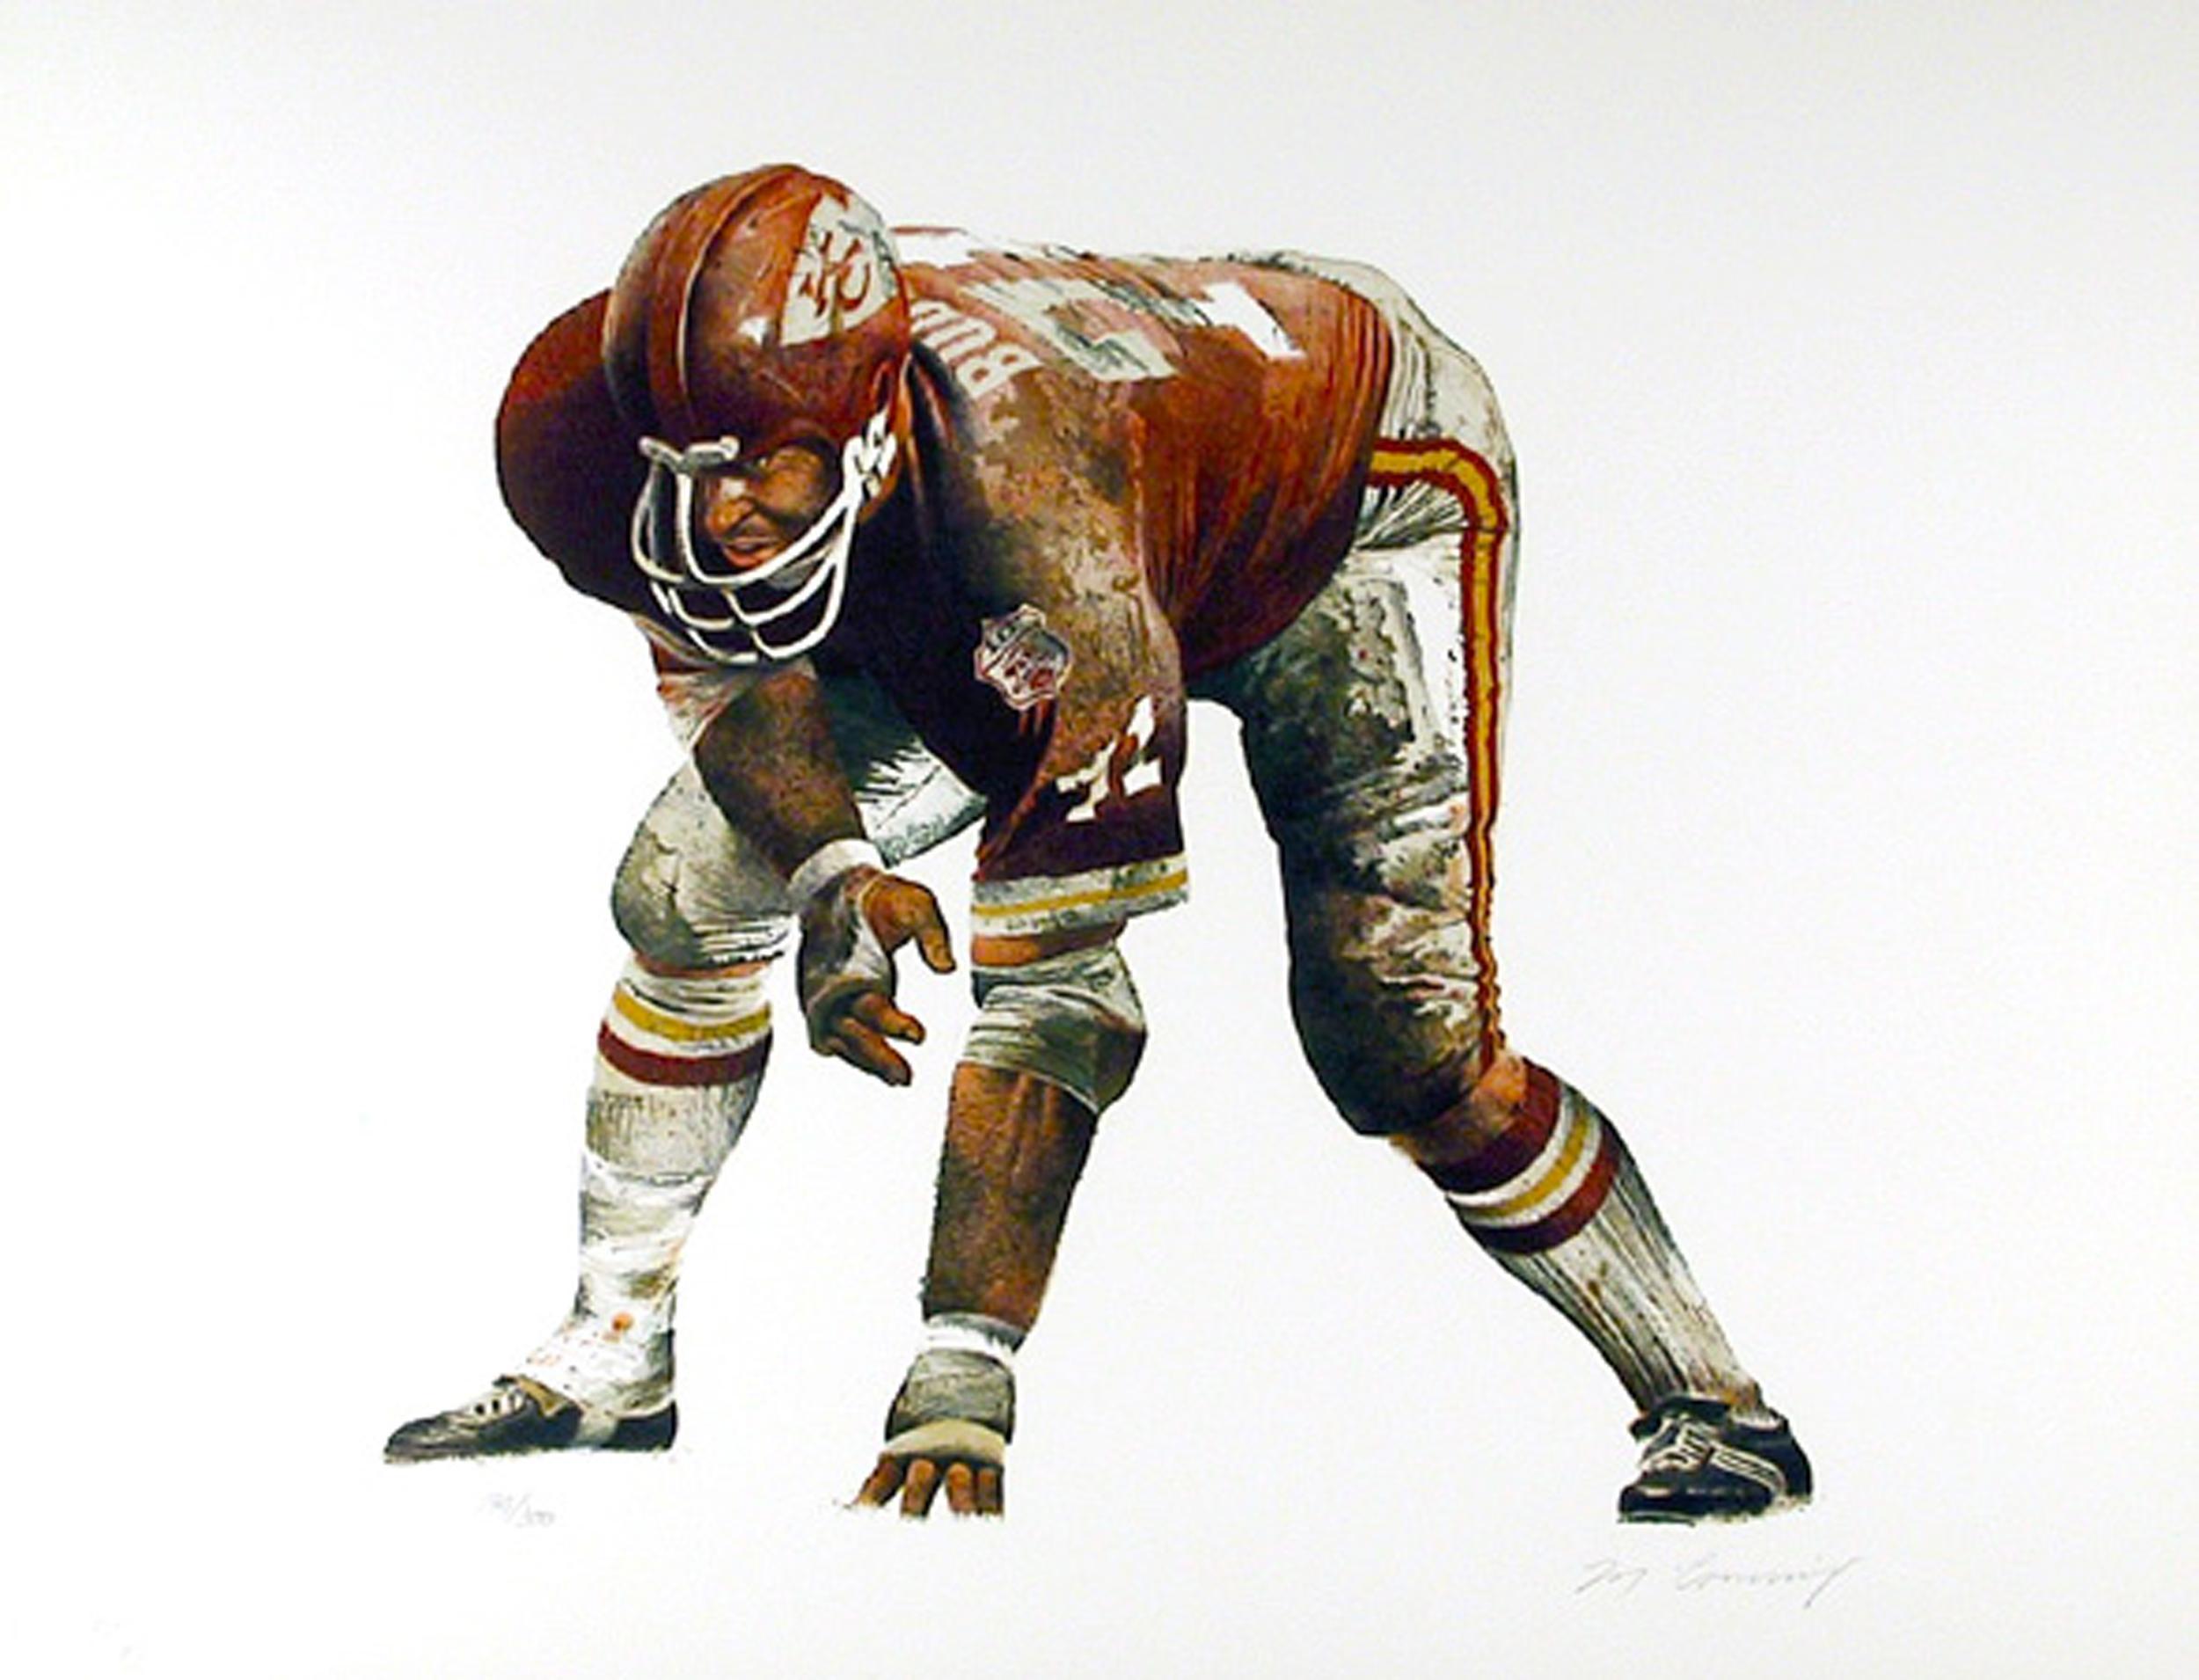 Merv Corning, On the Line (Kansas City Chiefs), Lithograph